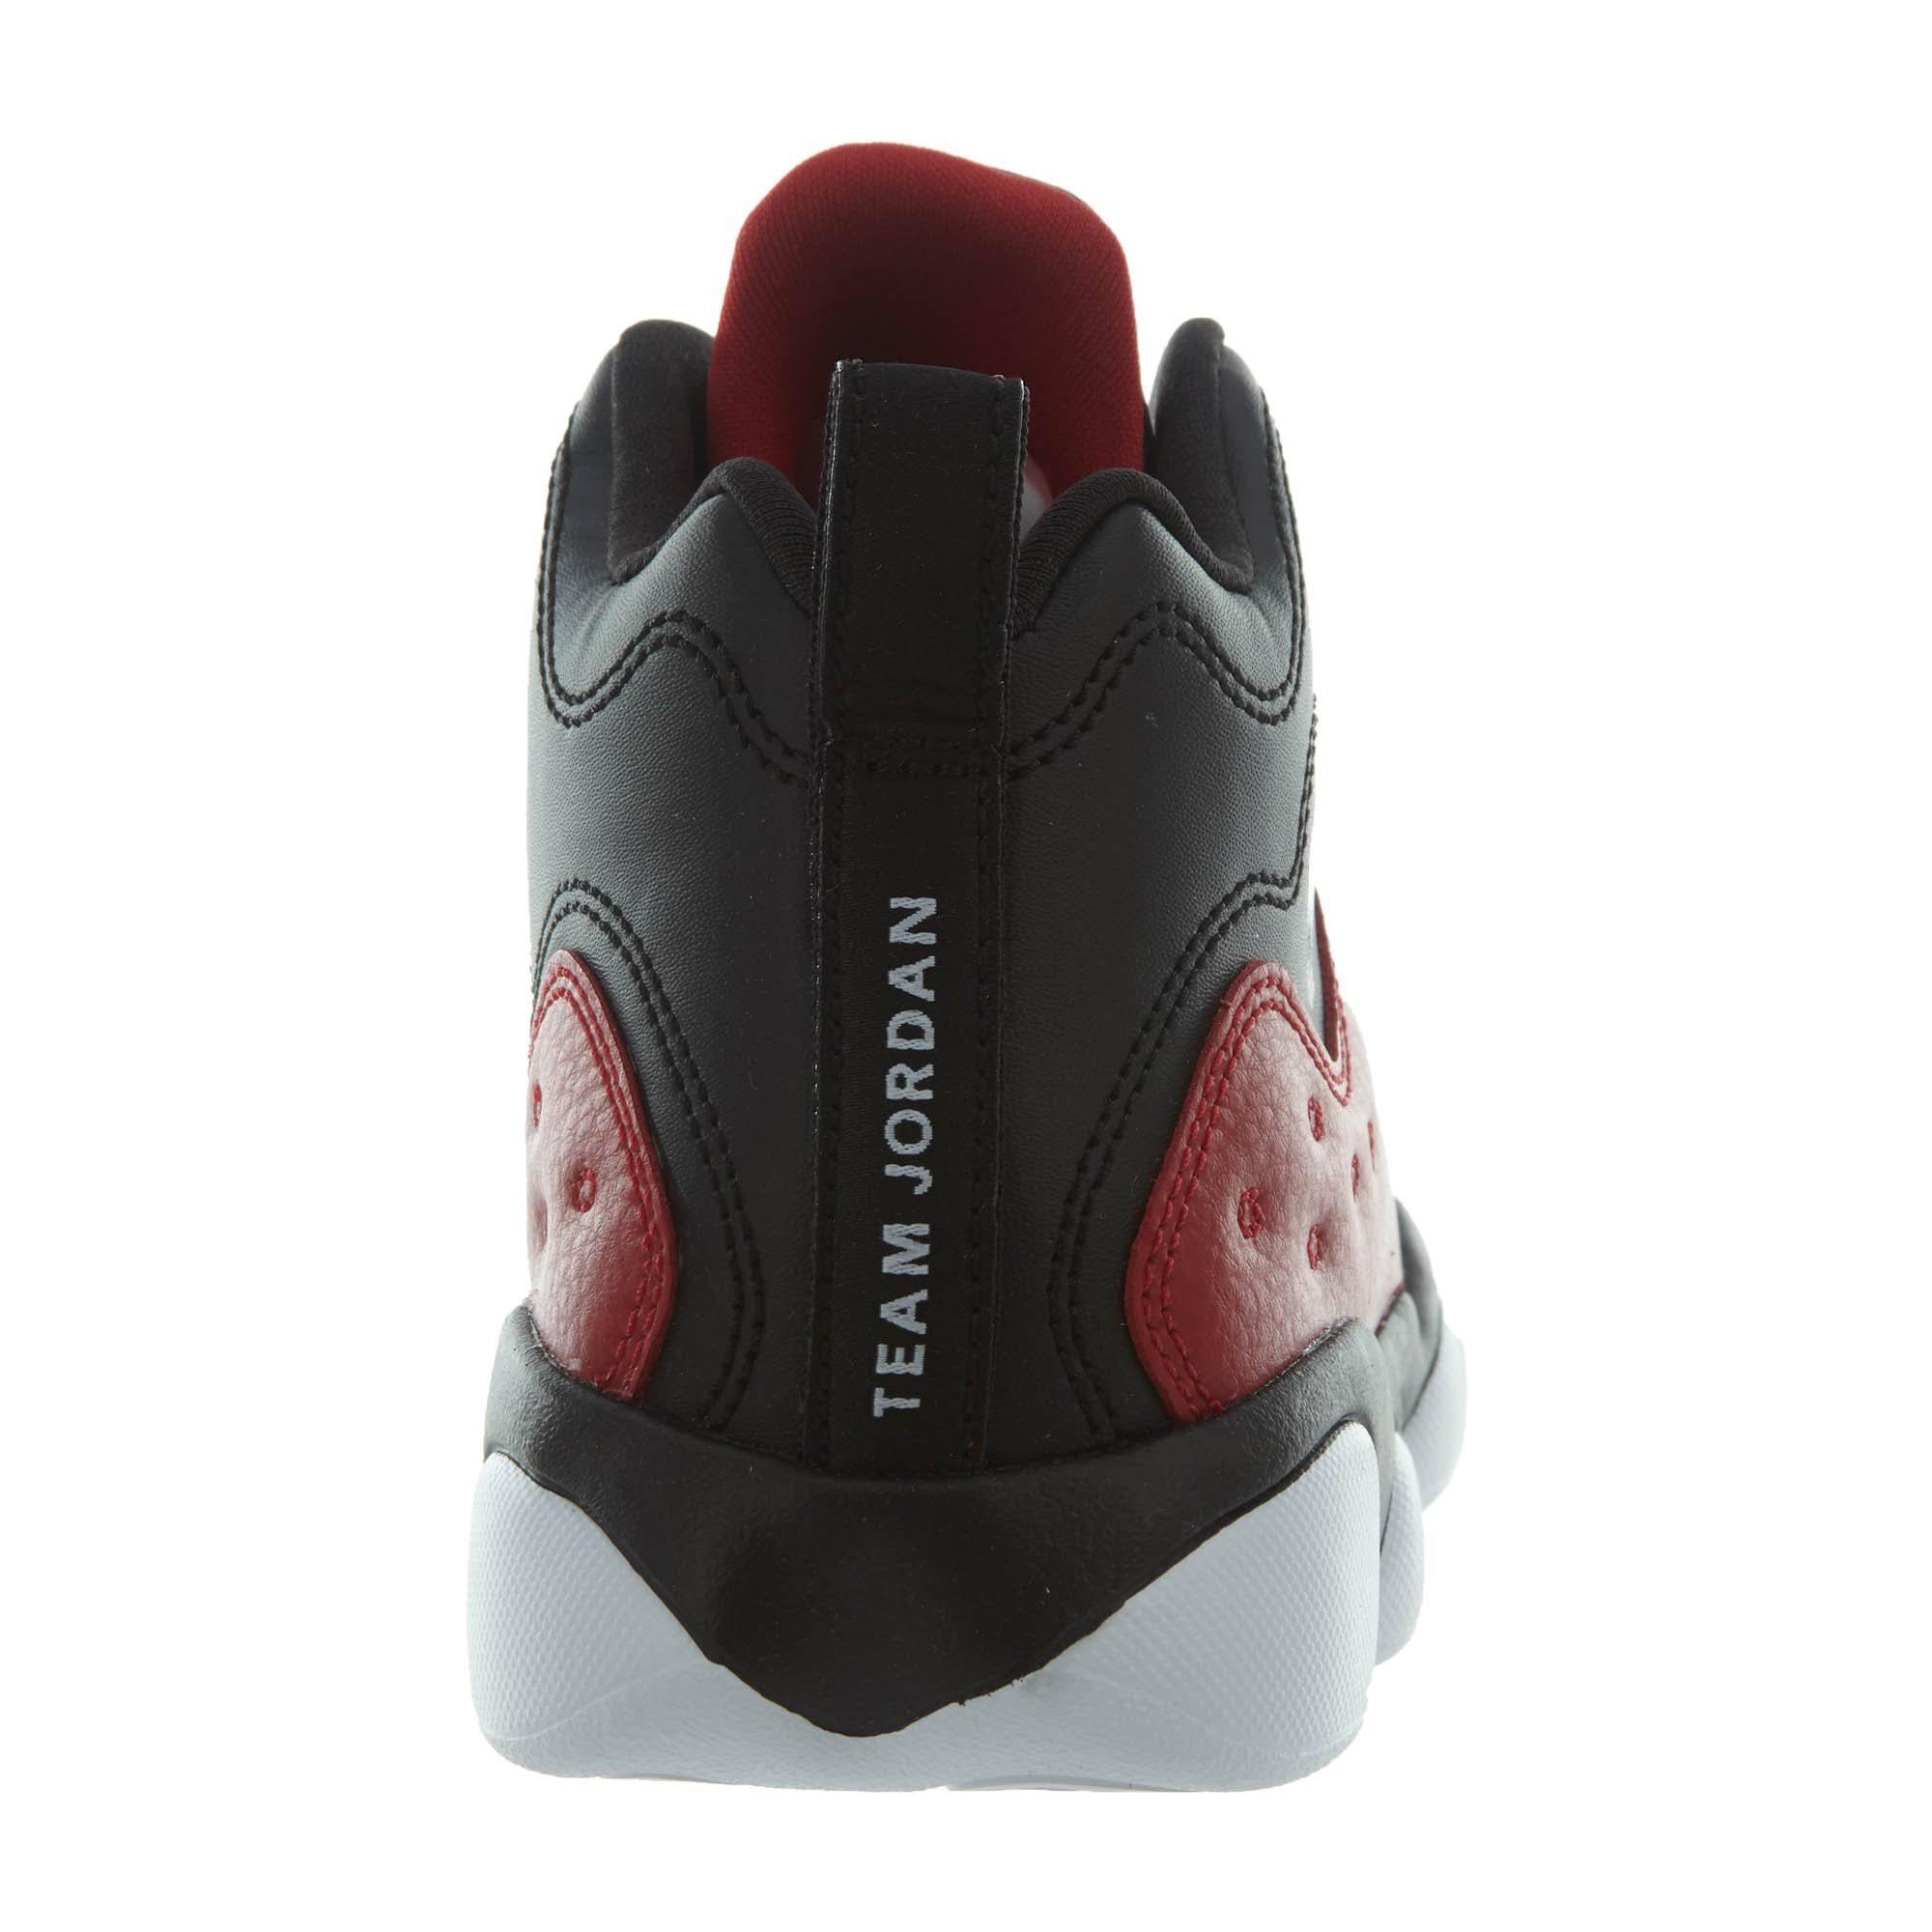 Preescolar Para Ii Baloncesto Niños Gym Zapatillas Jumpman Jordan Red Team De xwPYpAq6n